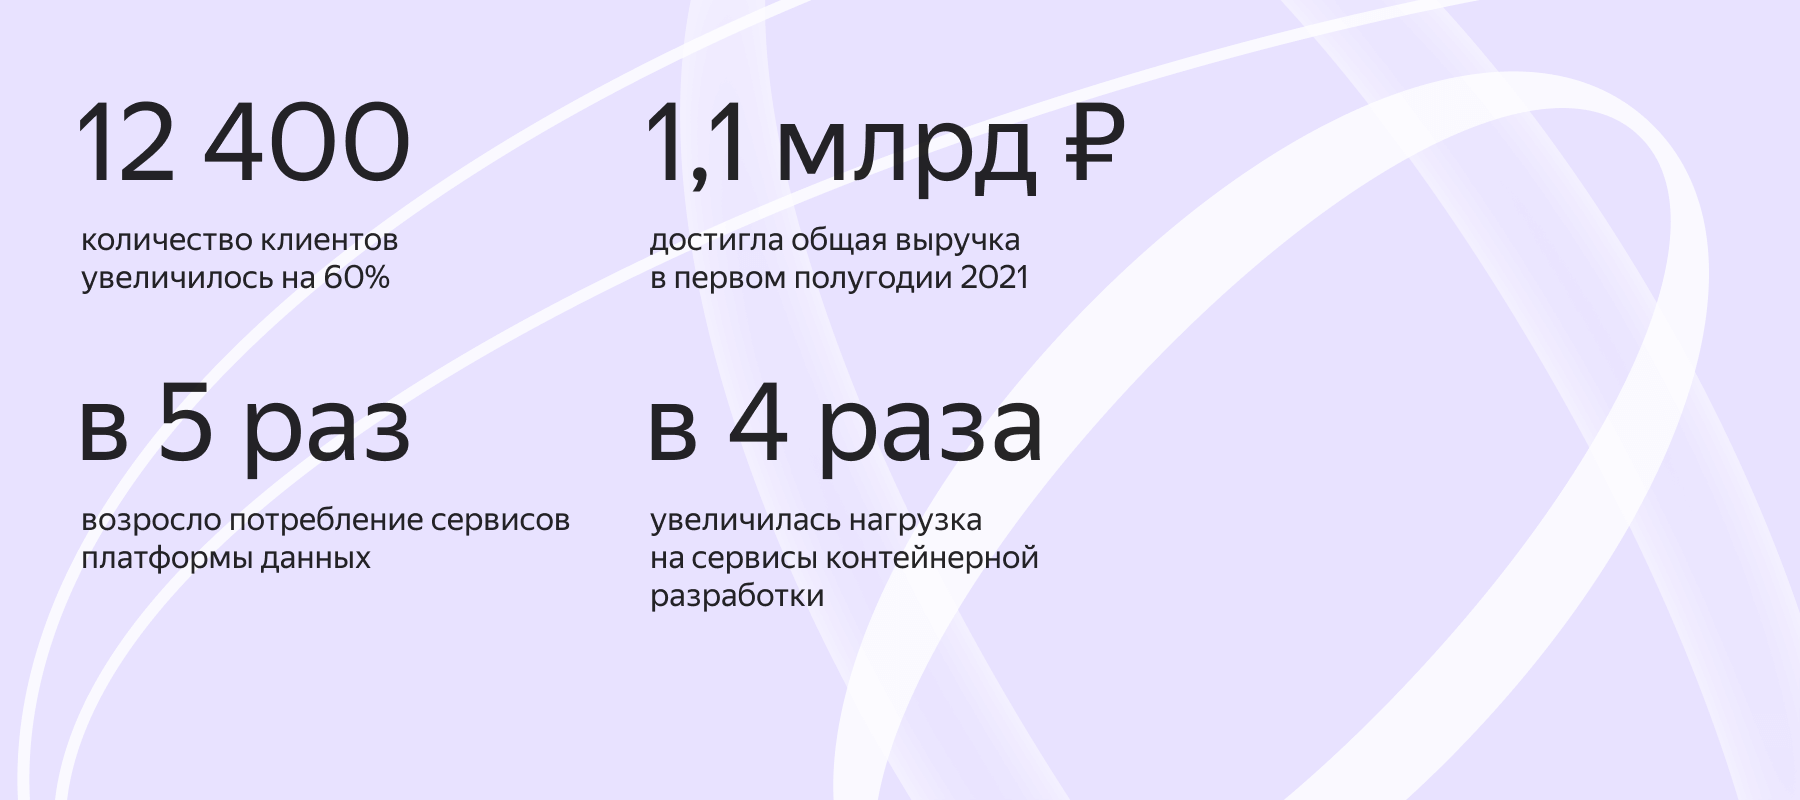 Yandex.Cloud financial results